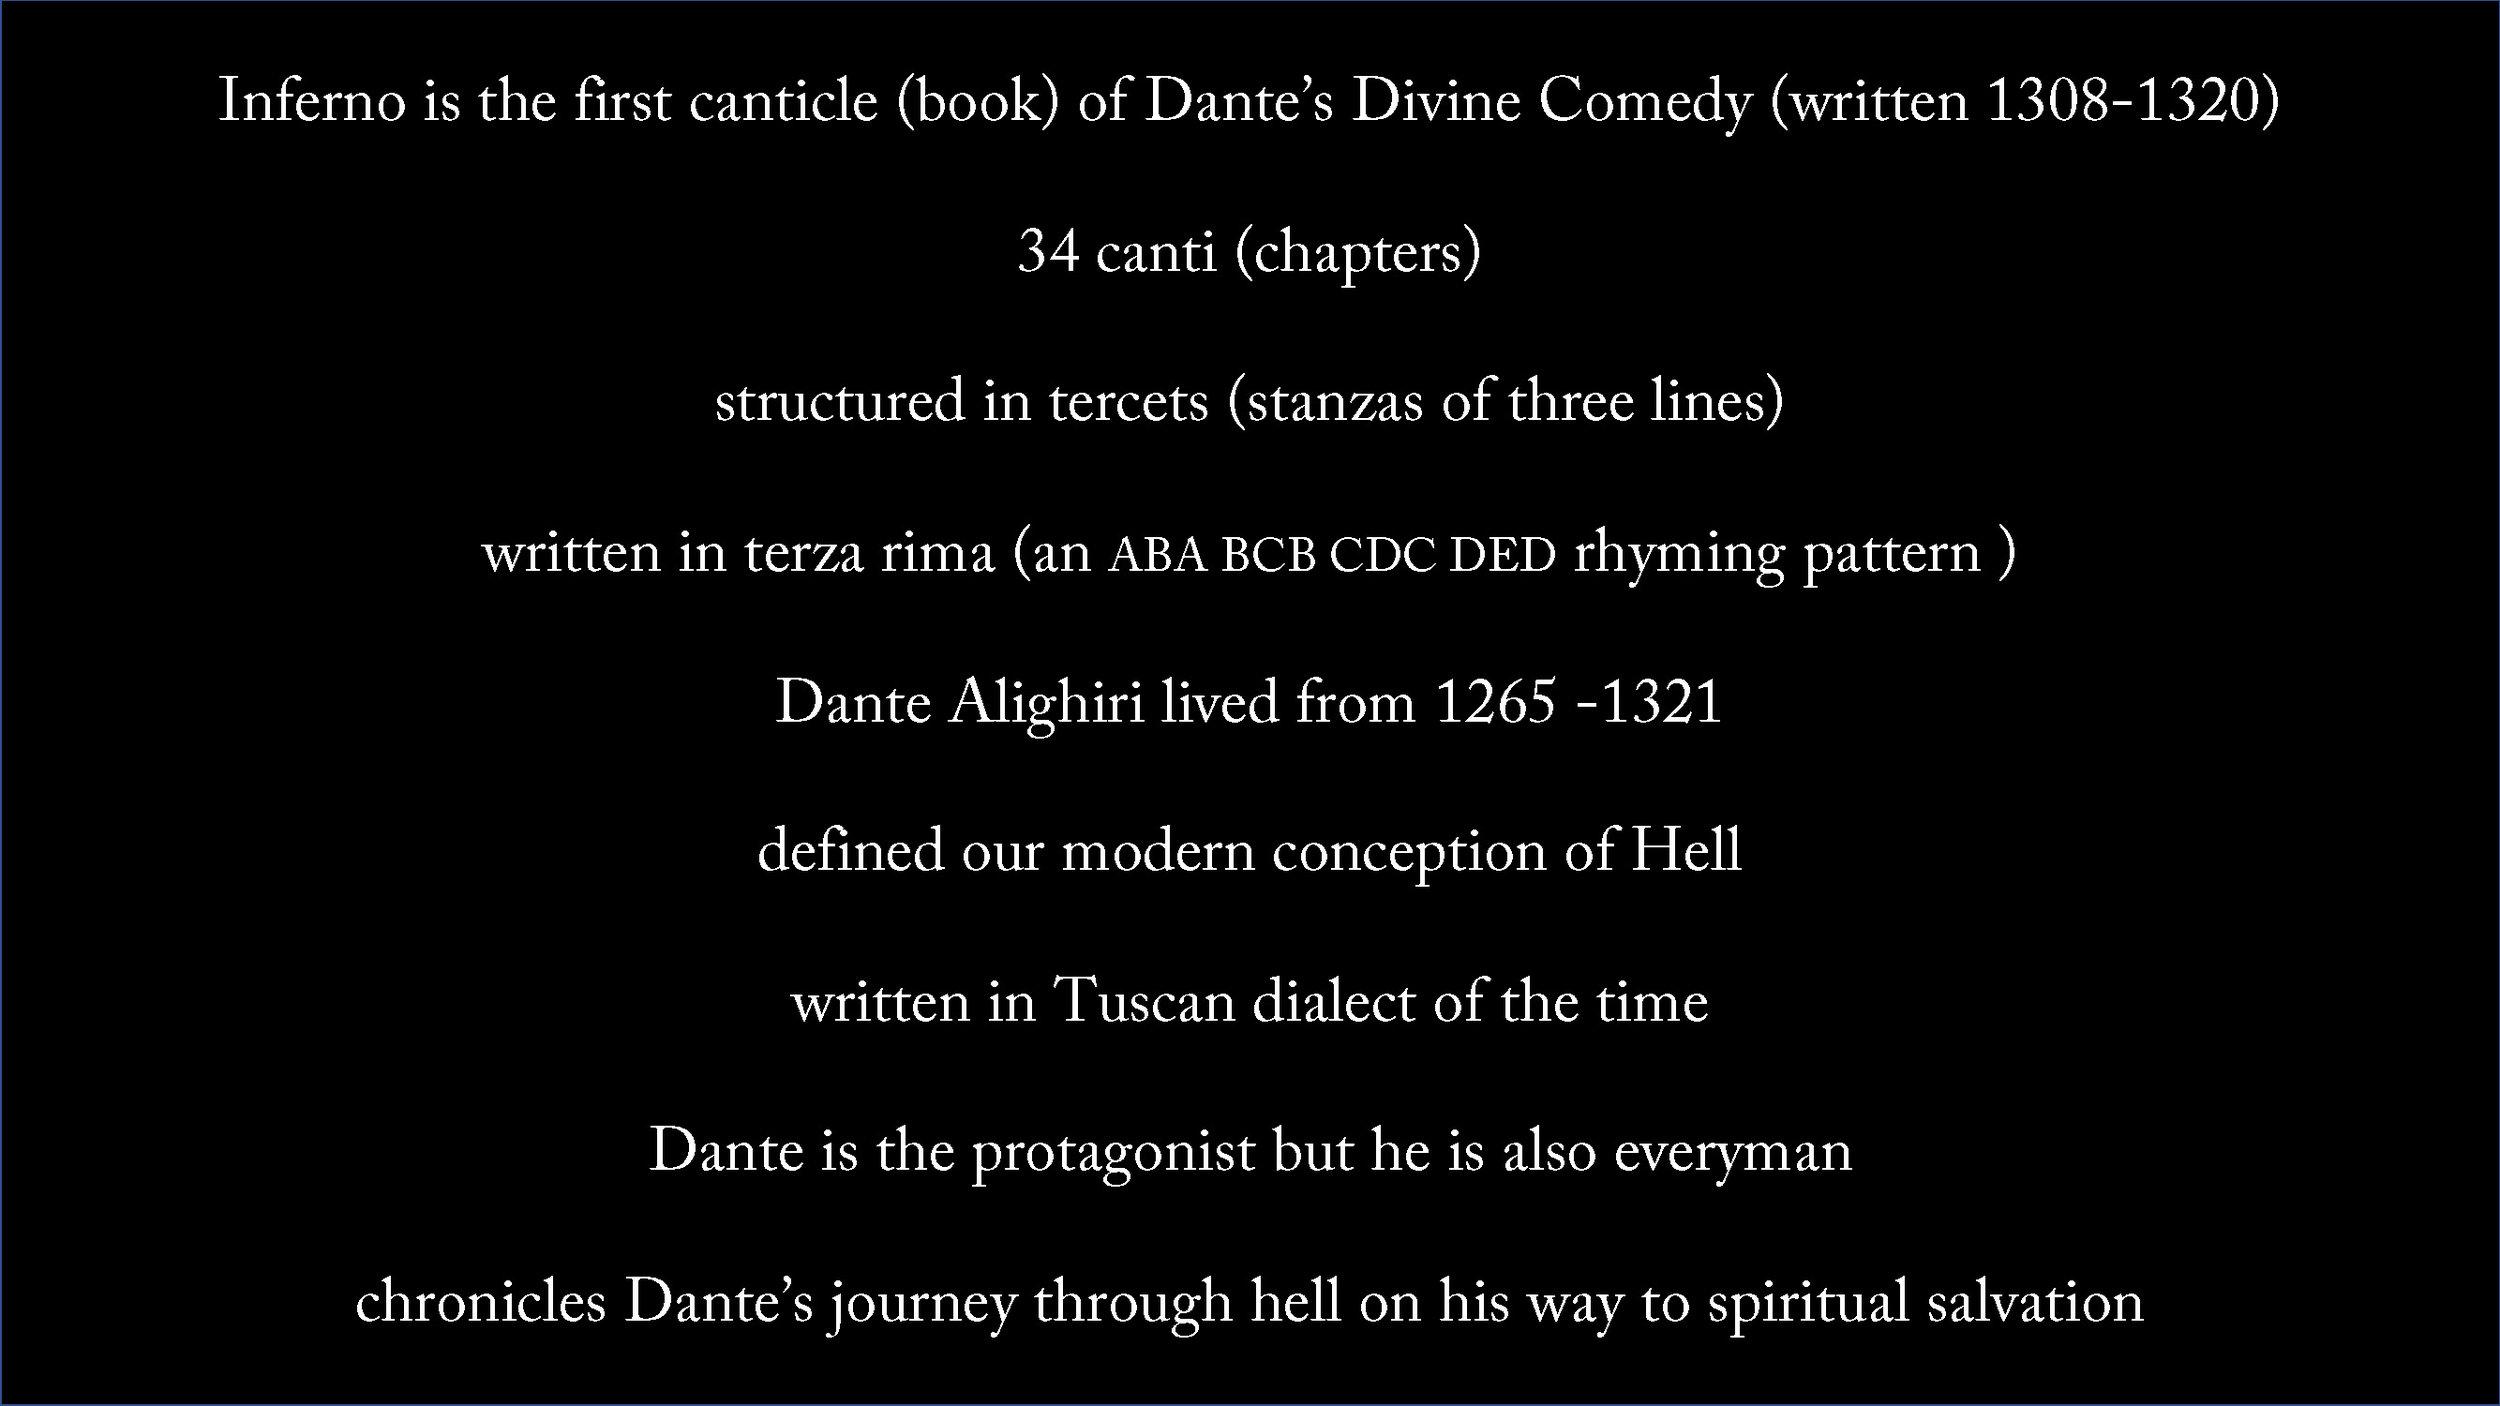 Illustrating Dante's Inferno_Infosession_Full Program_Page_03.jpg